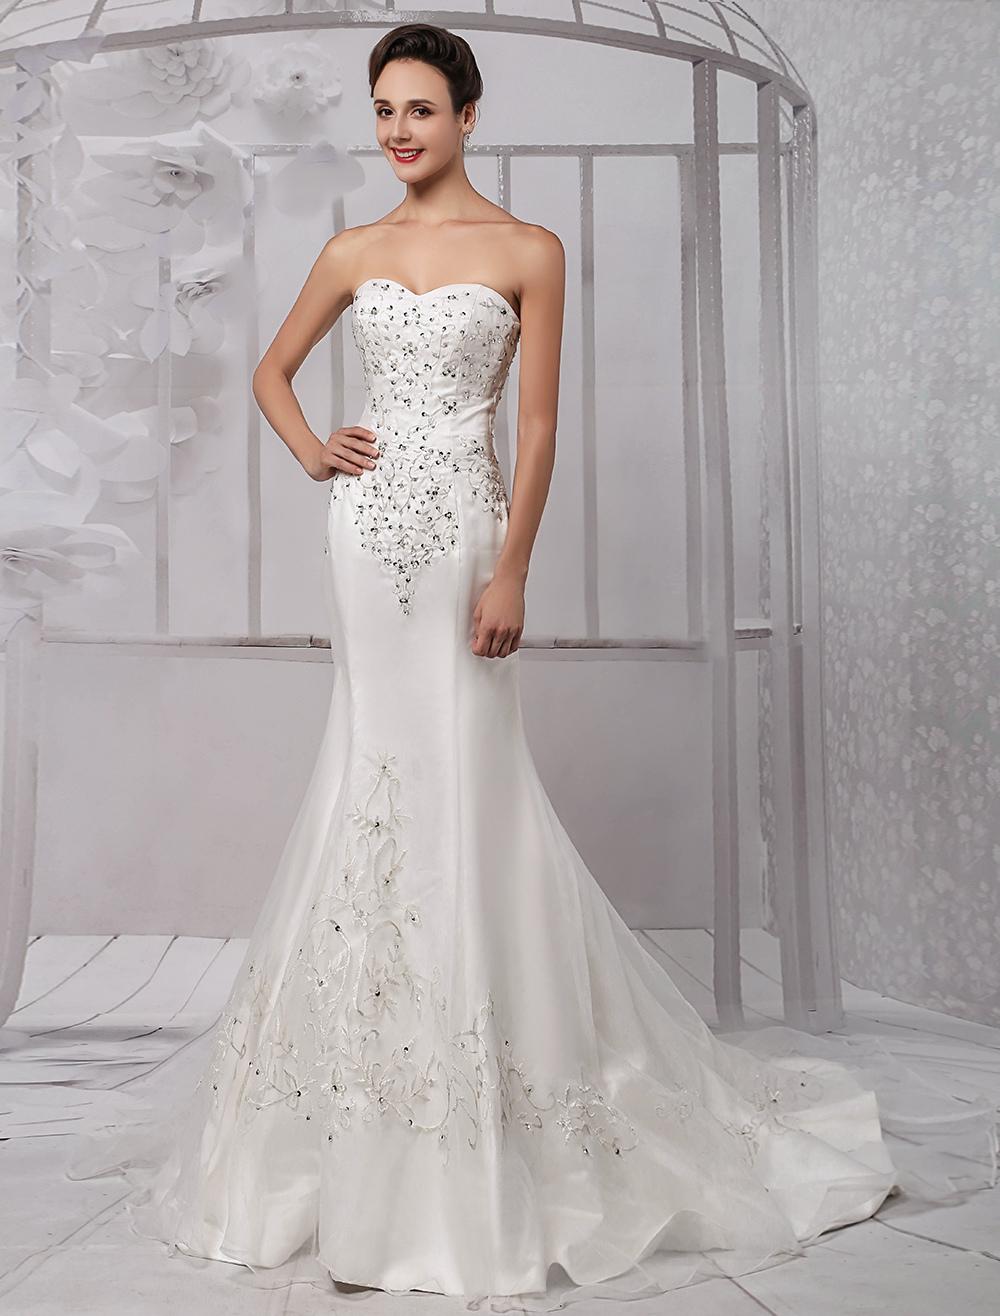 Trumpet/Mermaid Sweetheart Chapel Train Satin Organza Wedding Dress With Embroidered Beading